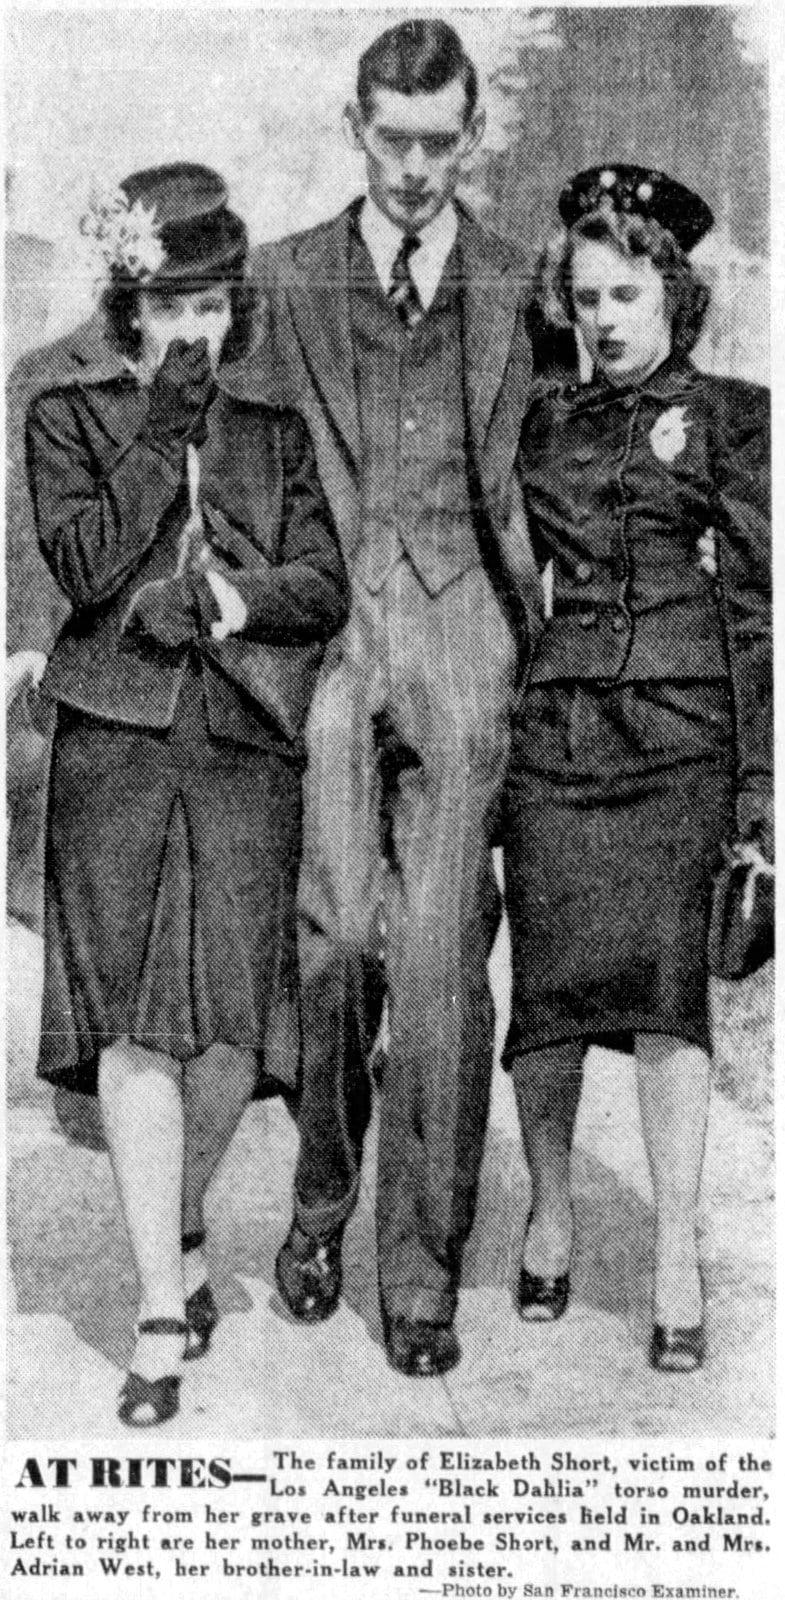 Black Dahlia - Elizabeth Short funeral services in Oakland - January 26 1947